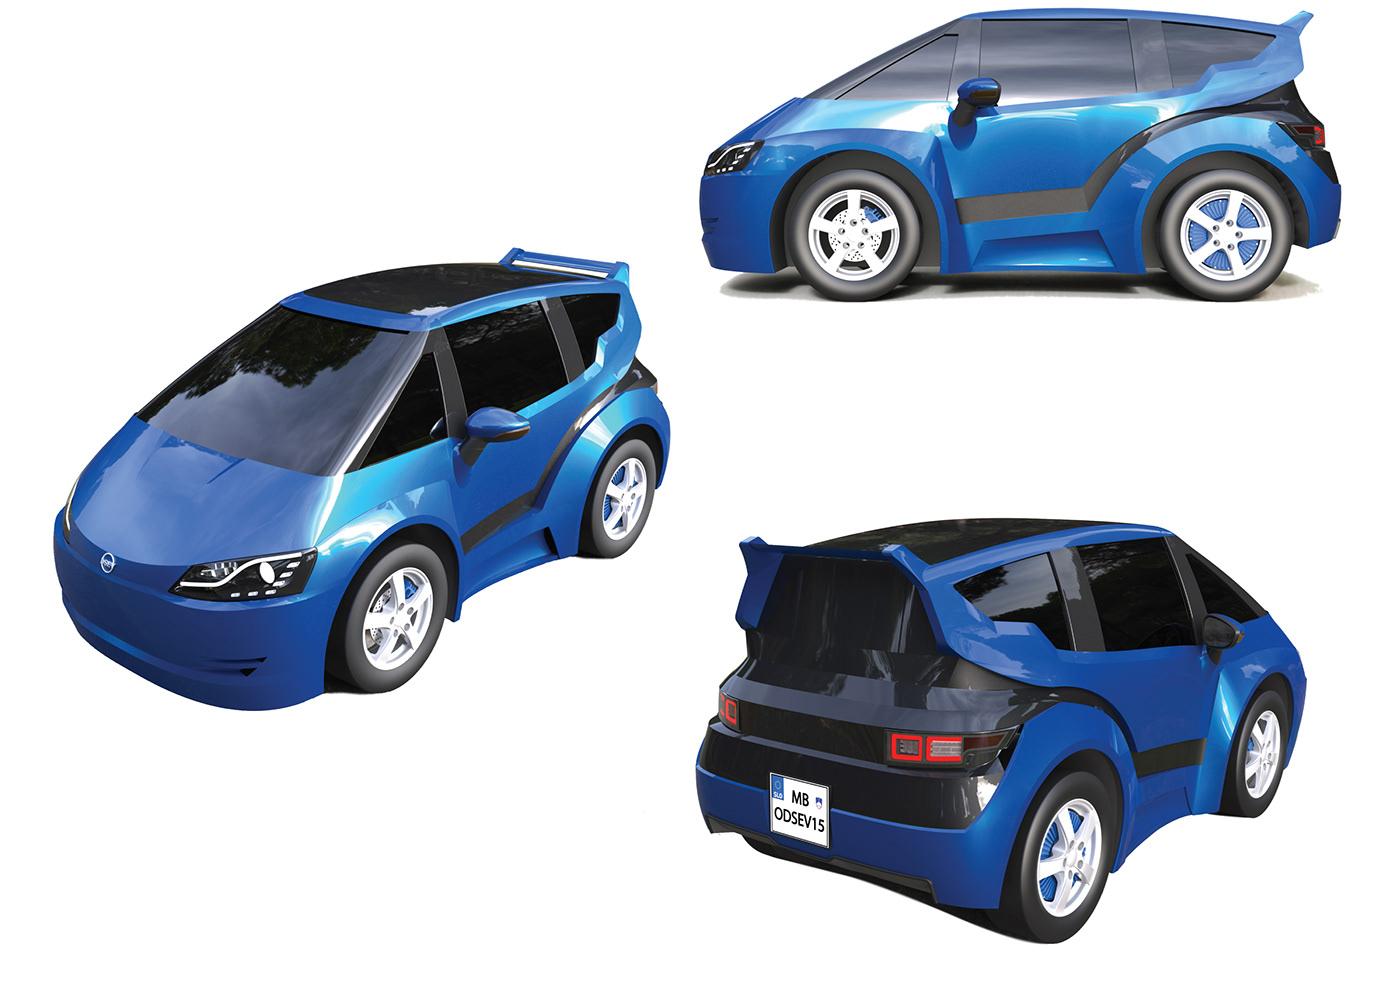 odsev electric ev L7E small electric car